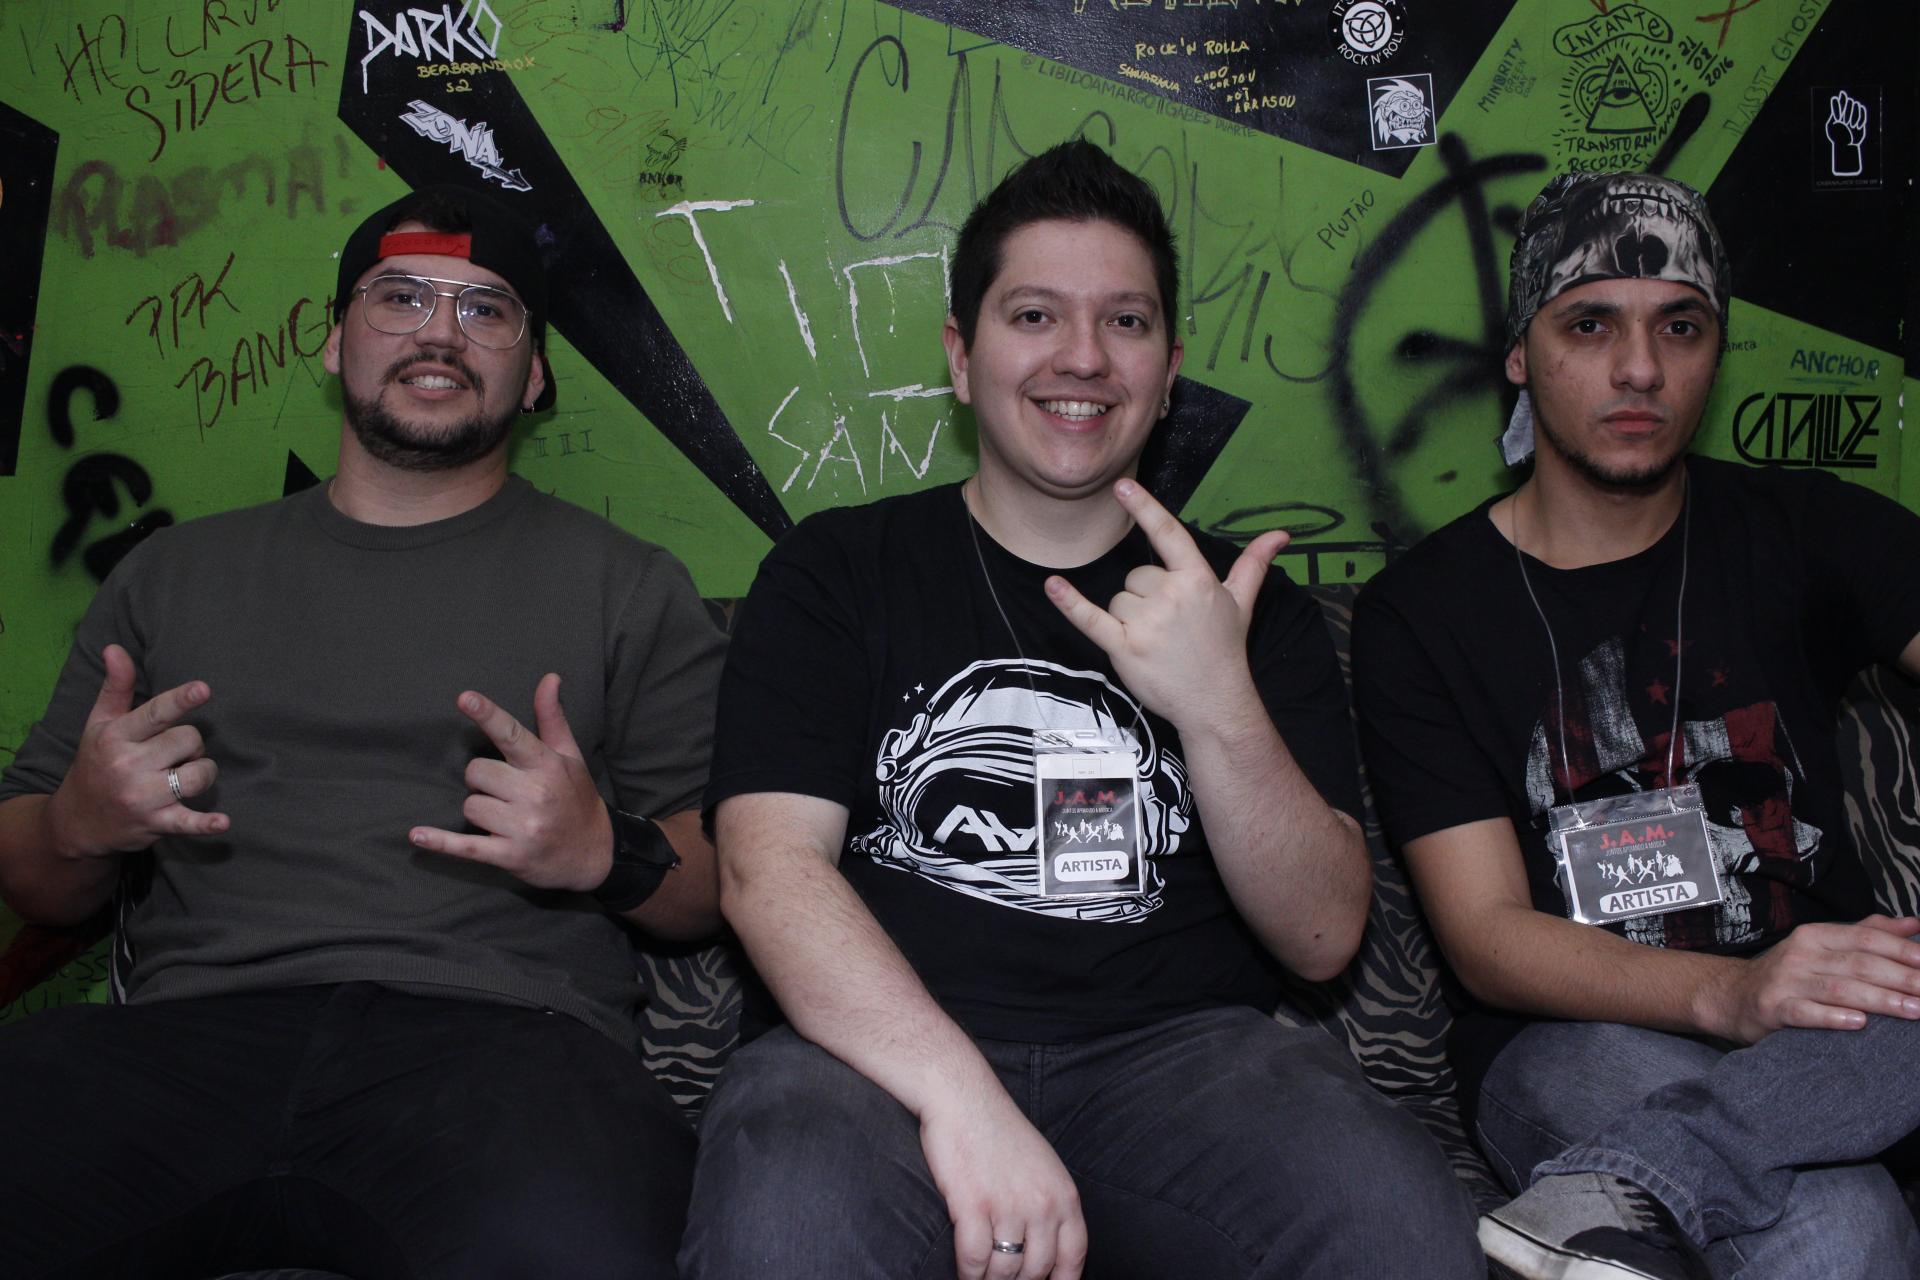 Fotos Saturday Rock 21 da Banda Boltz